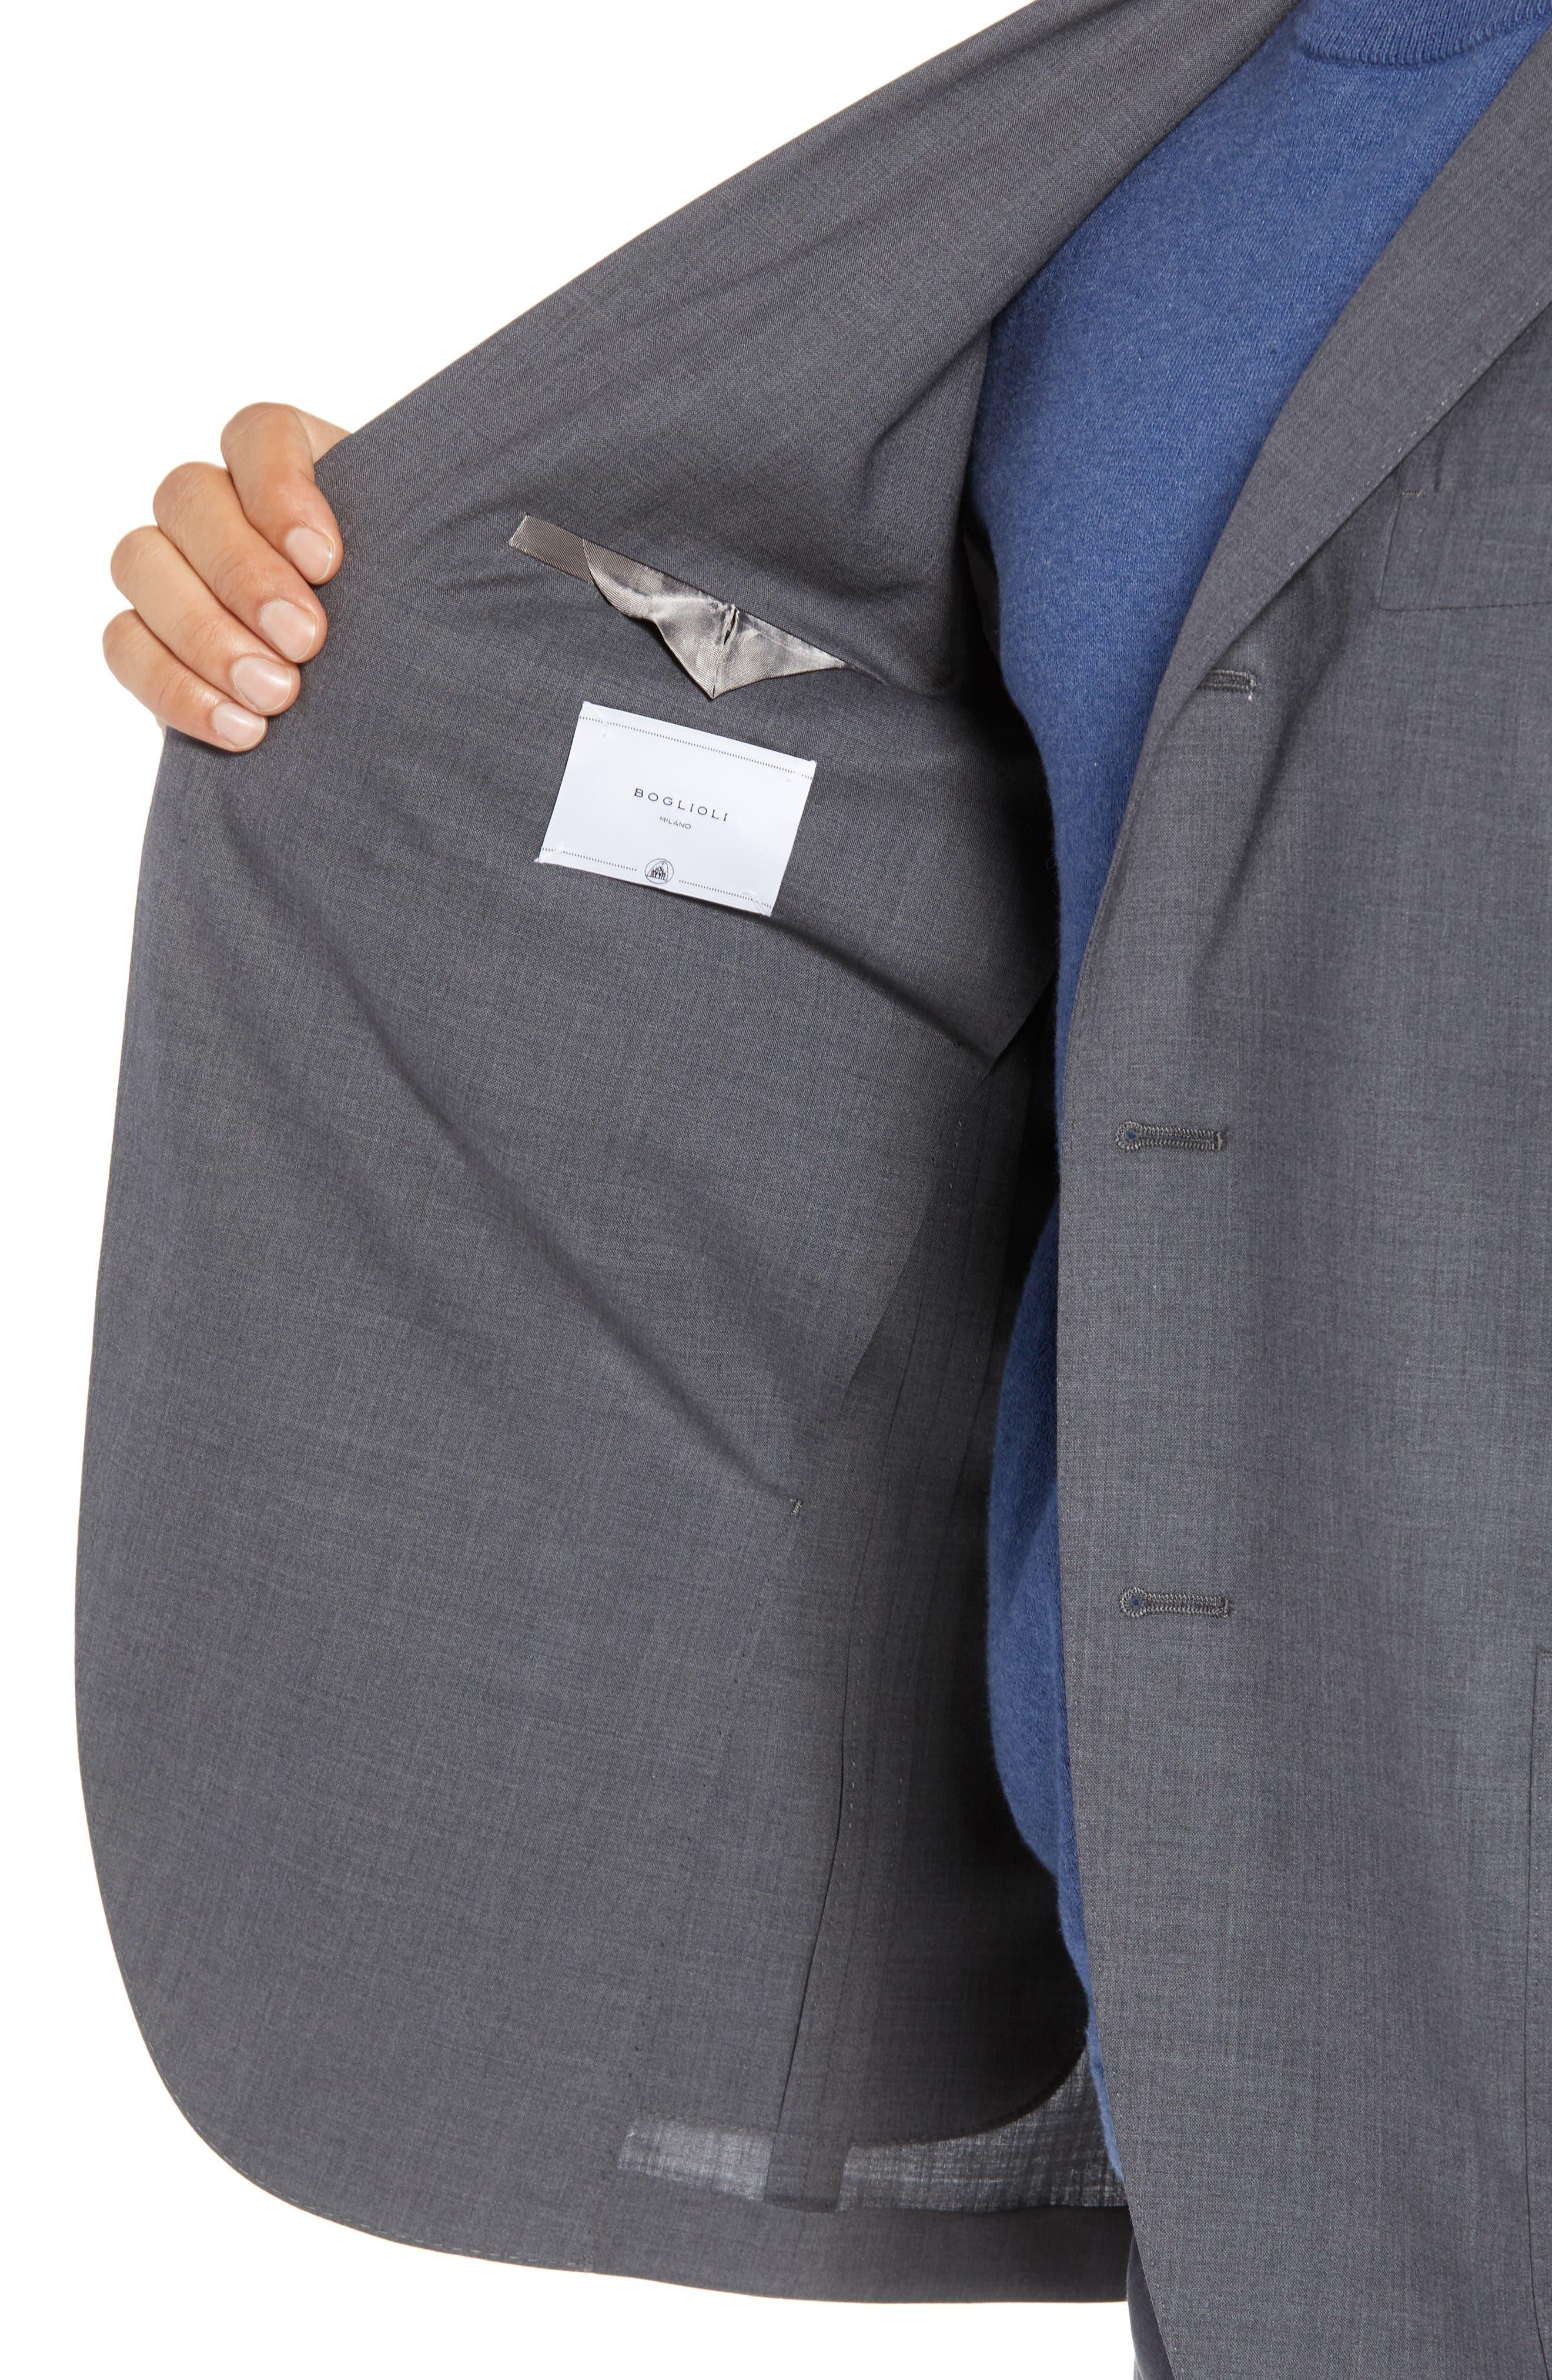 Trim Fit Solid Wool Suit,                             Alternate thumbnail 4, color,                             MEDIUM GREY